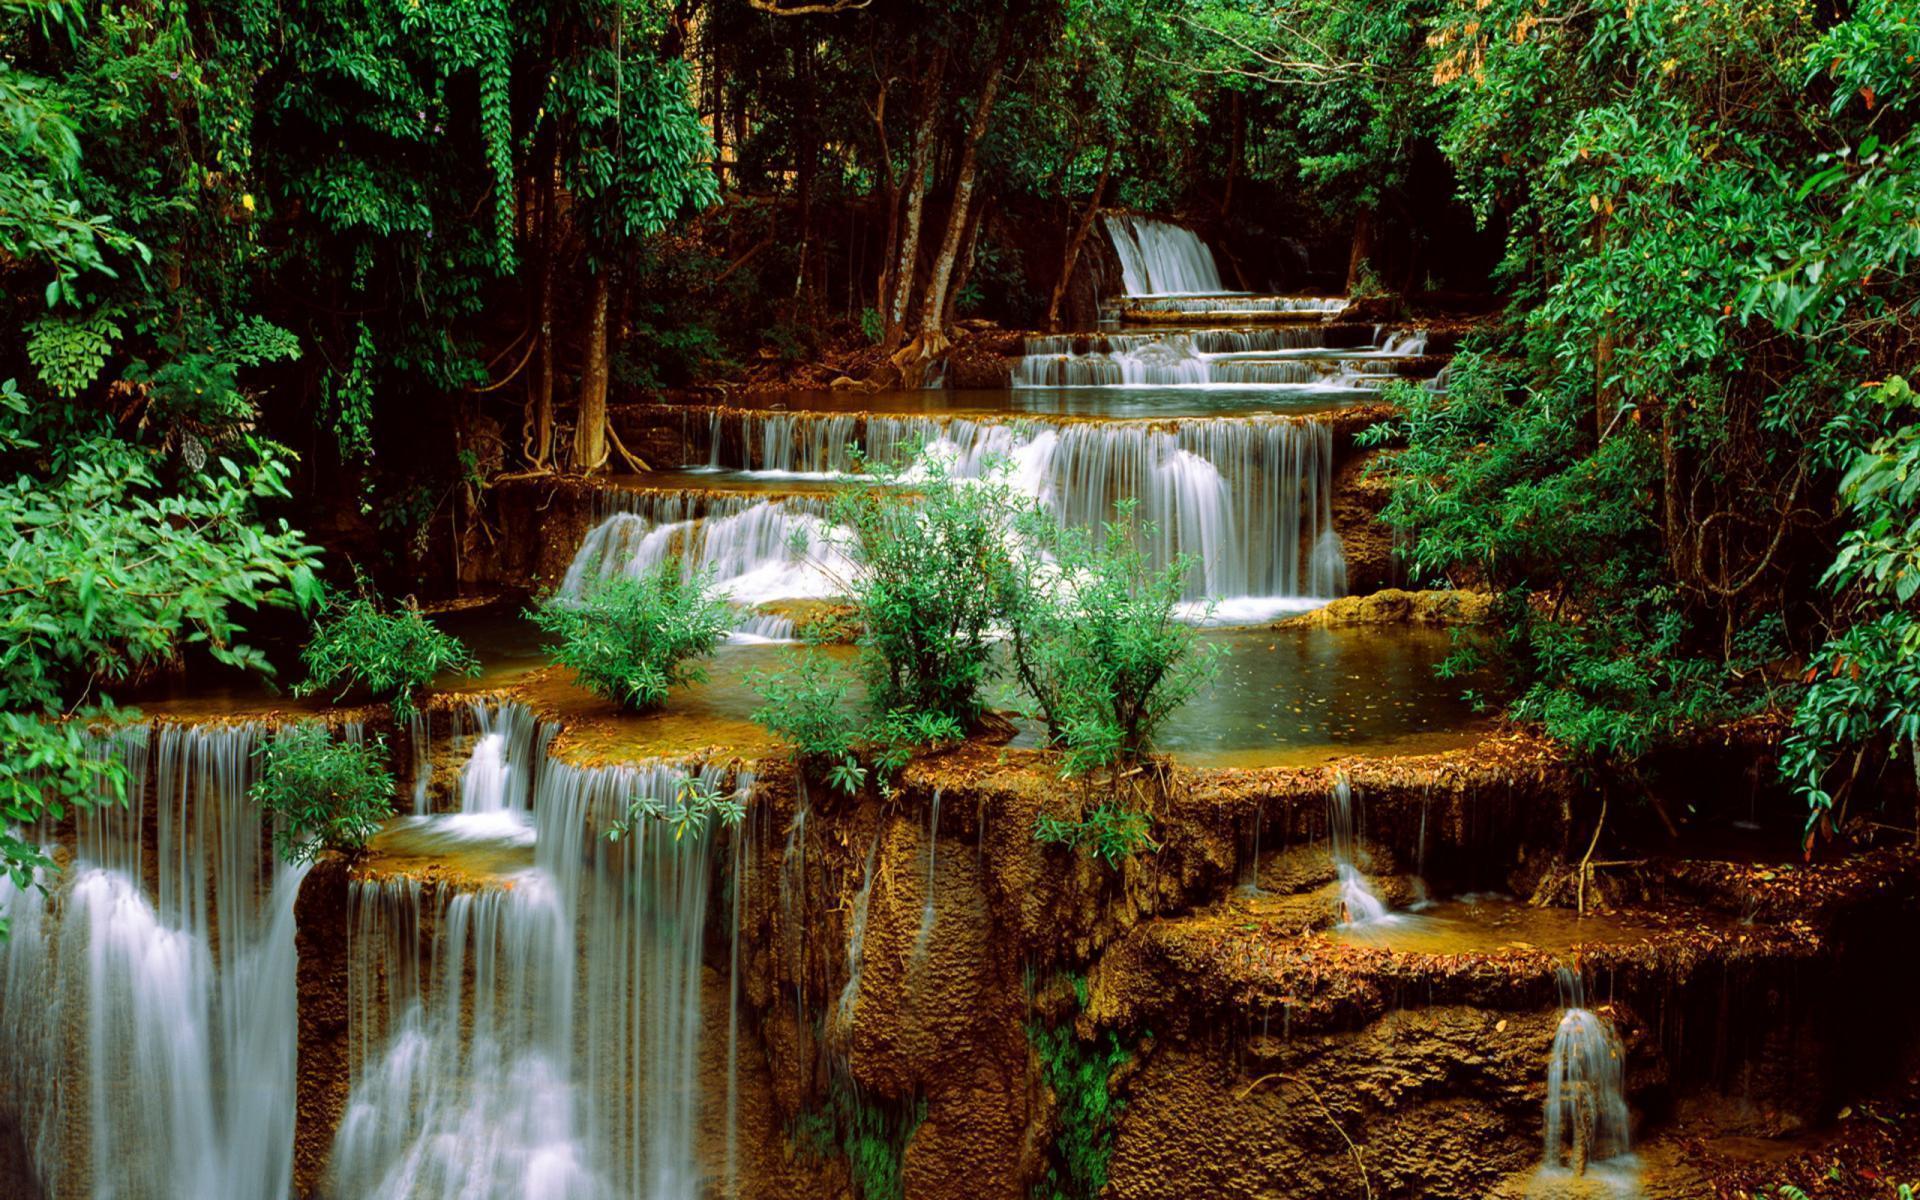 Waterfall Hd Wallpapers Wallpaper Cave